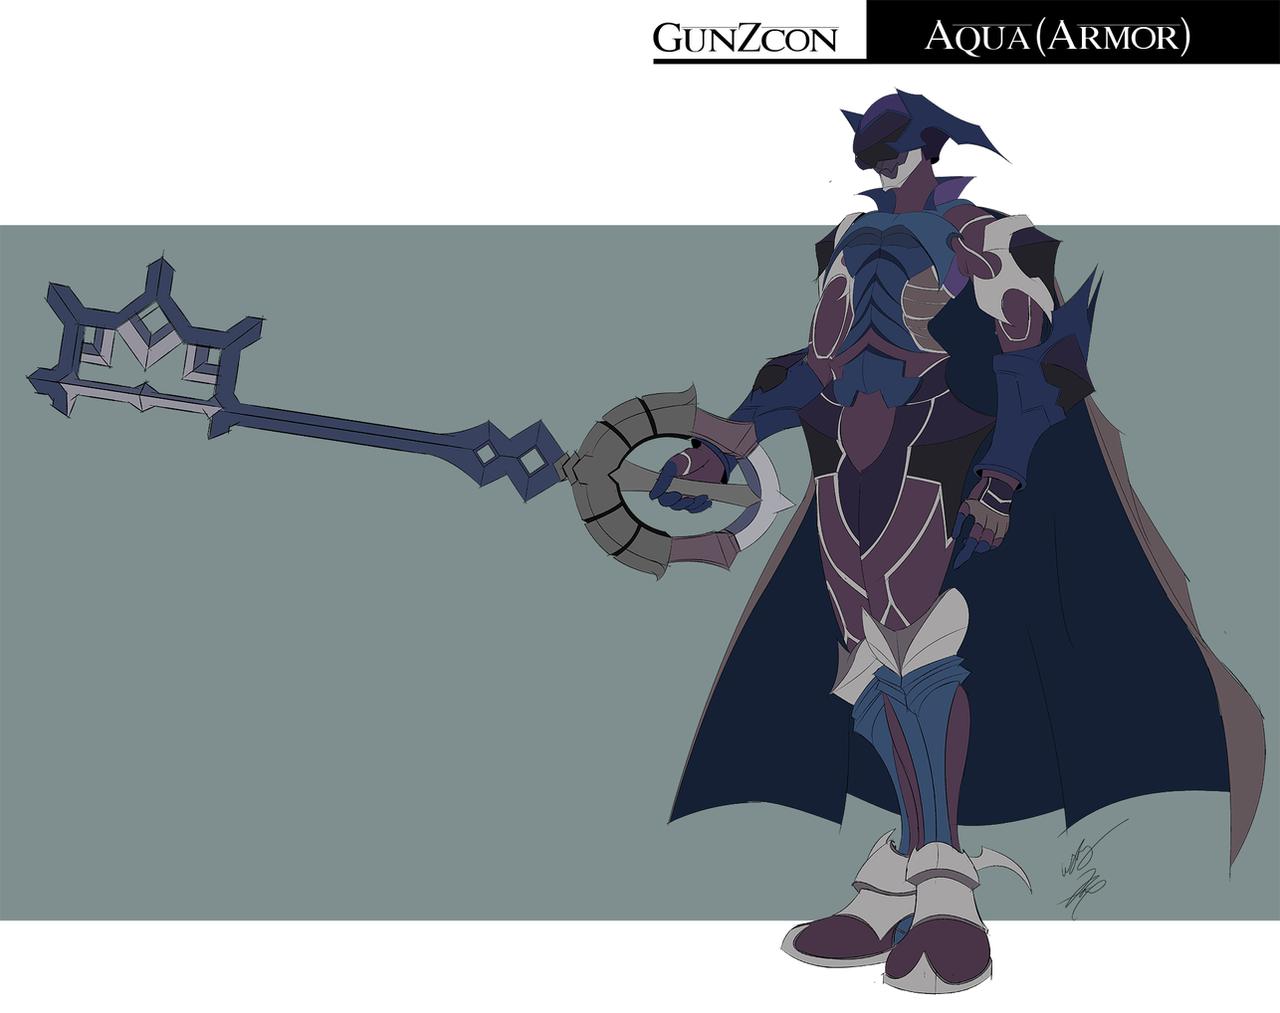 Aqua Armor by GunZcon on DeviantArt  Aqua Armor by G...